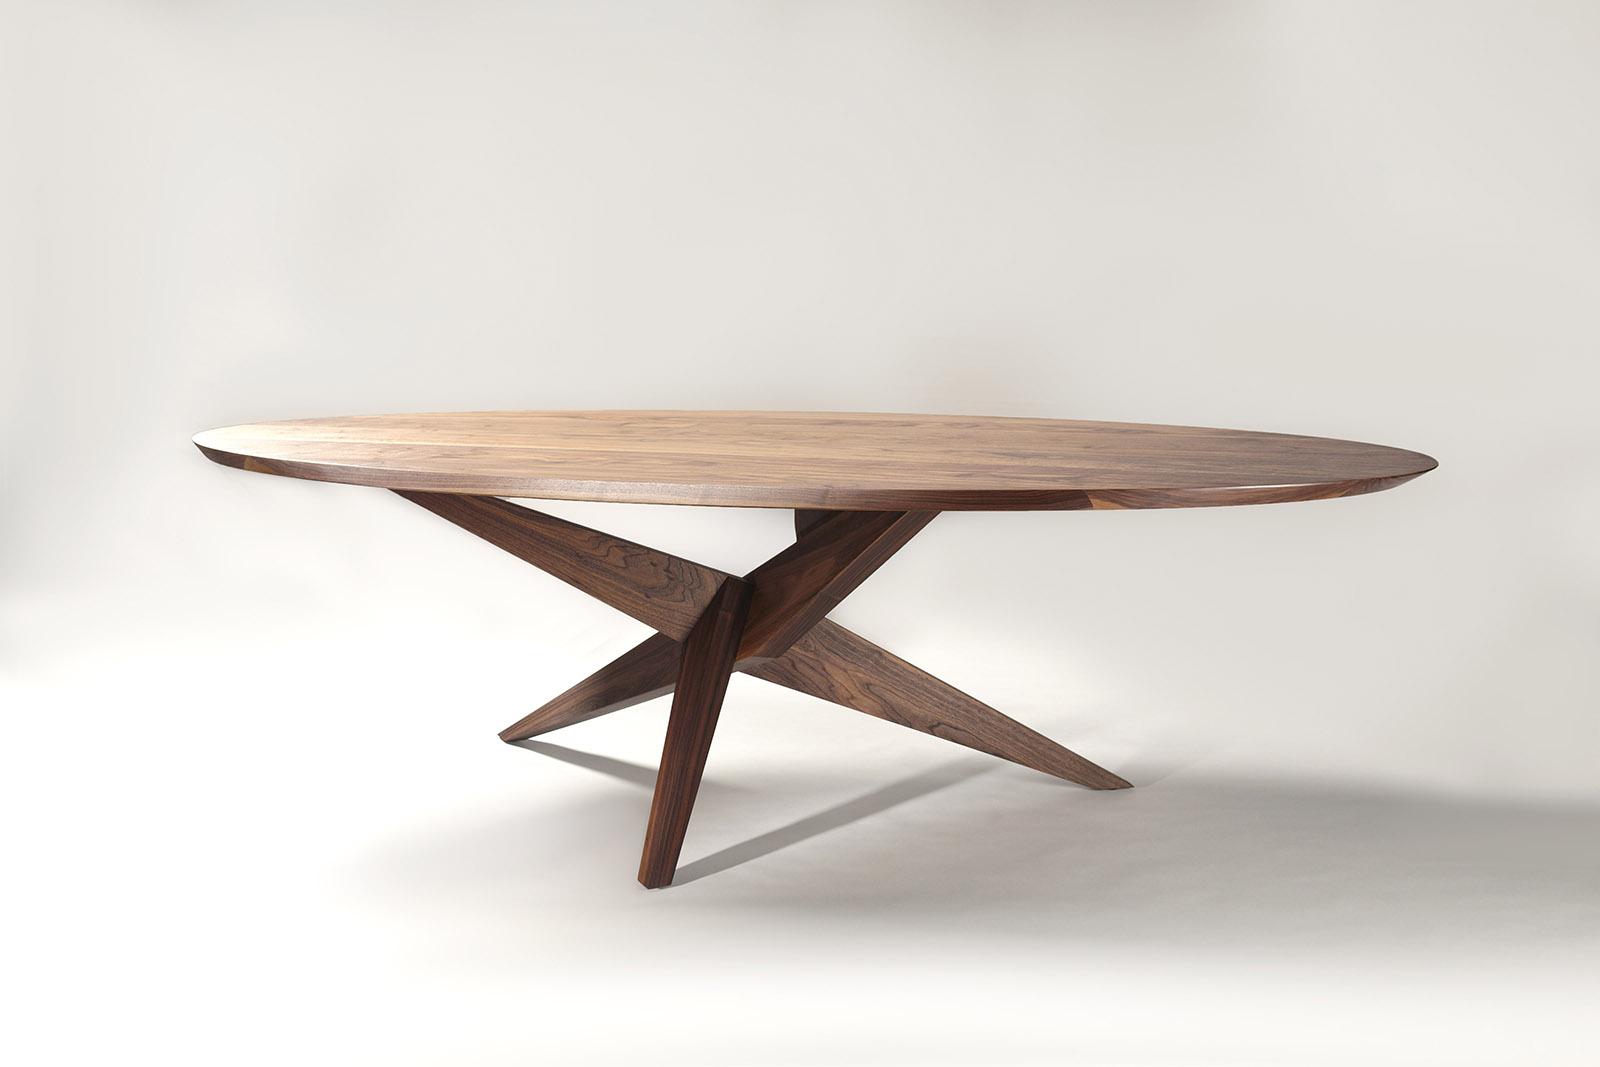 b table 2.jpg